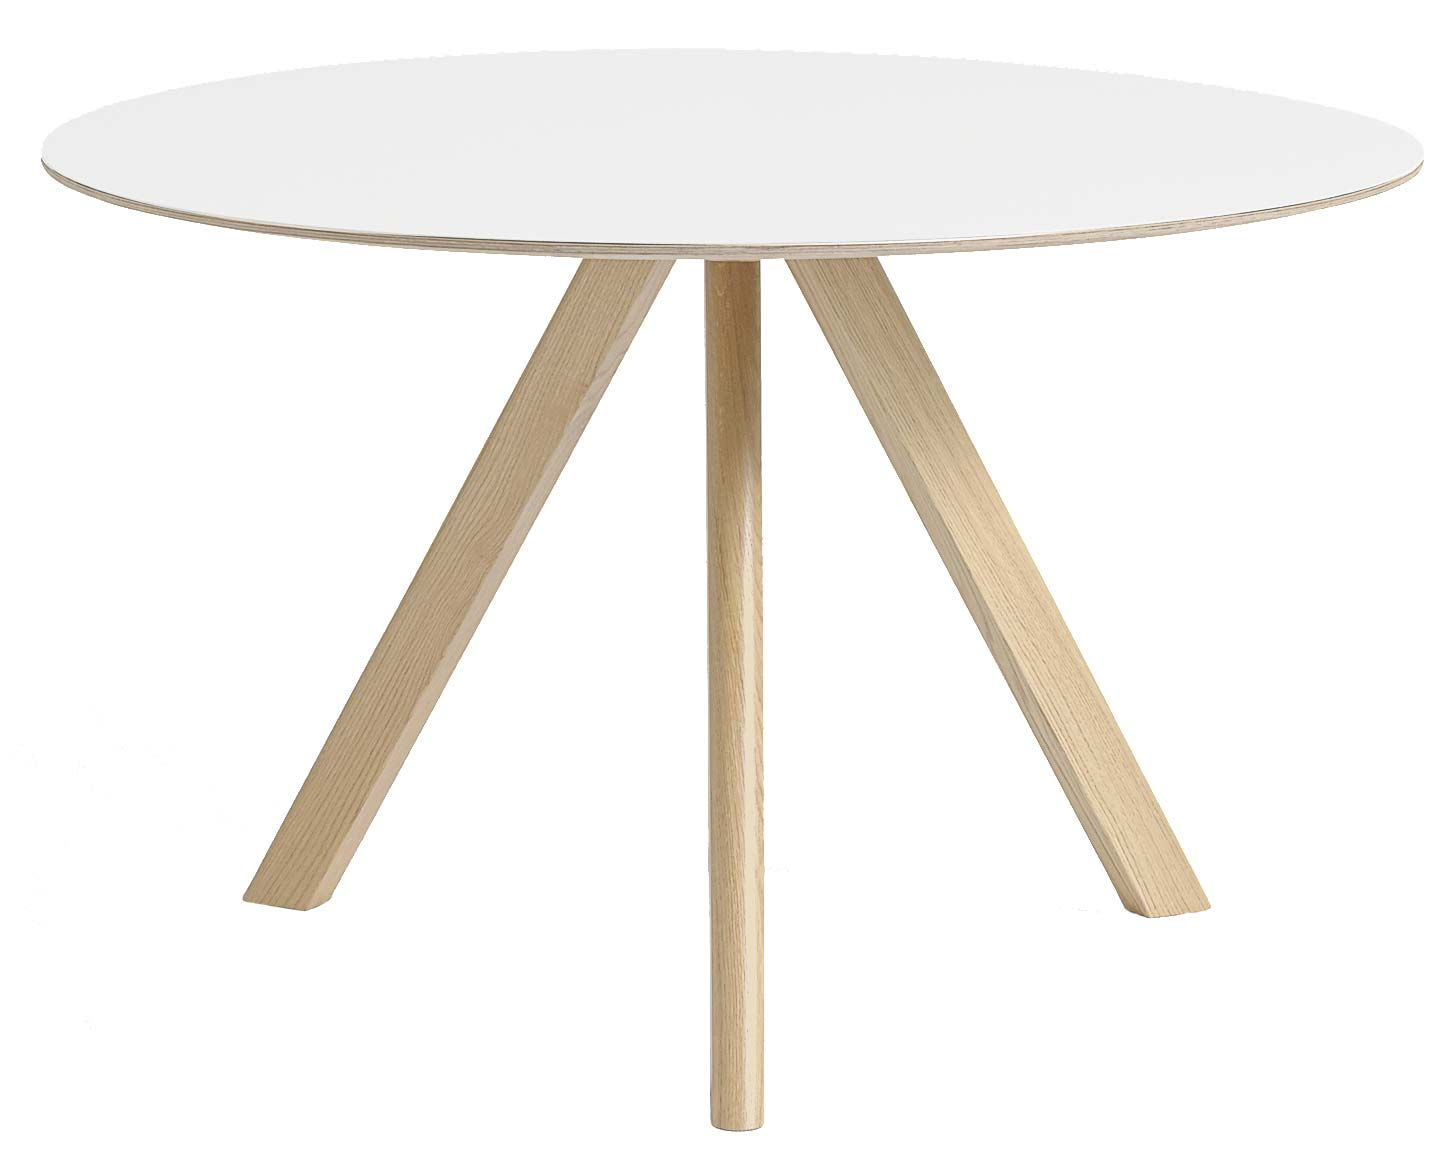 Ronde tafel in hout en laminaat of linoleum tafels